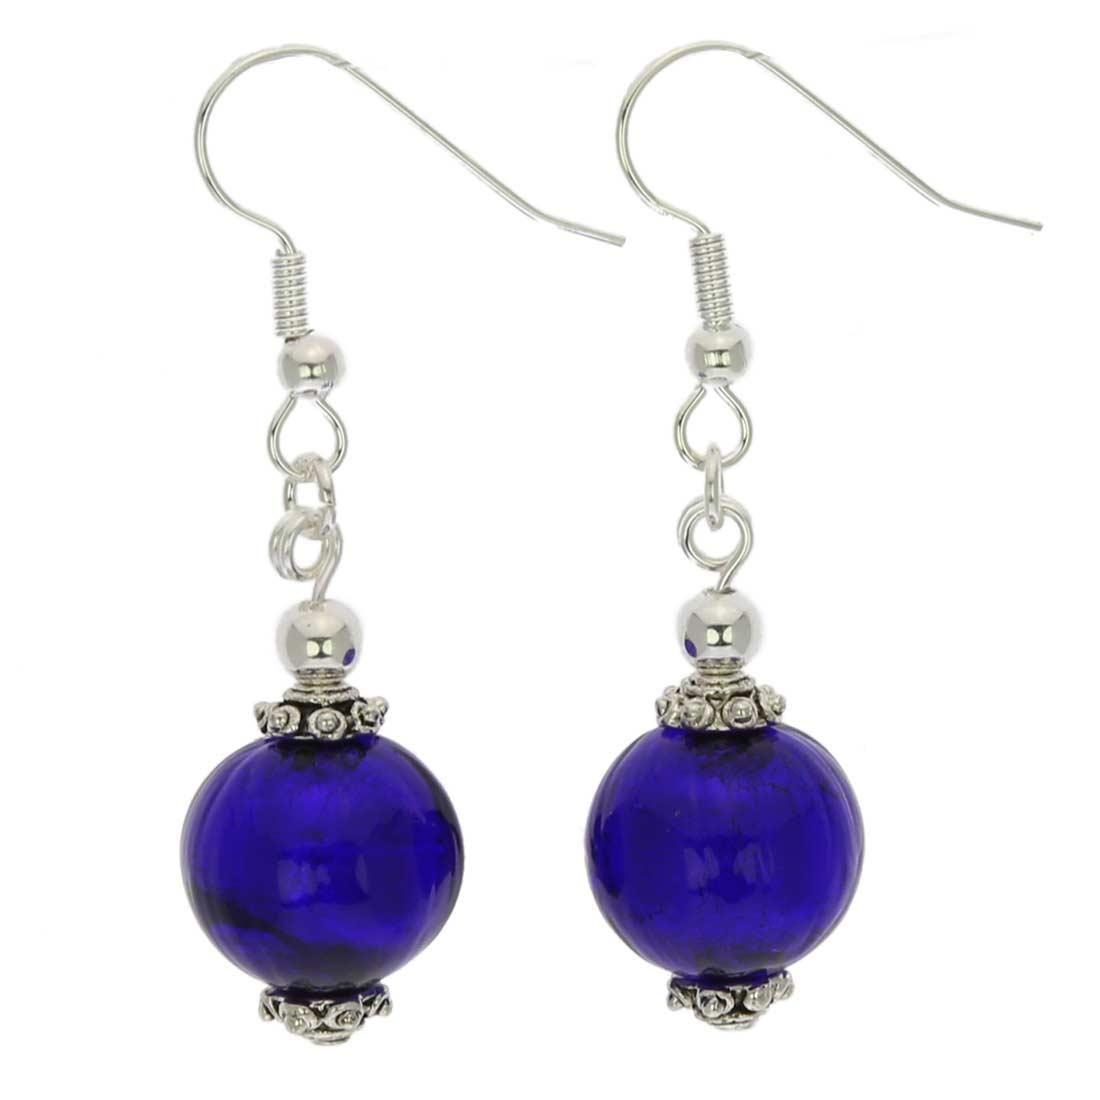 Antico Tesoro Balls Earrings - Silver Blue